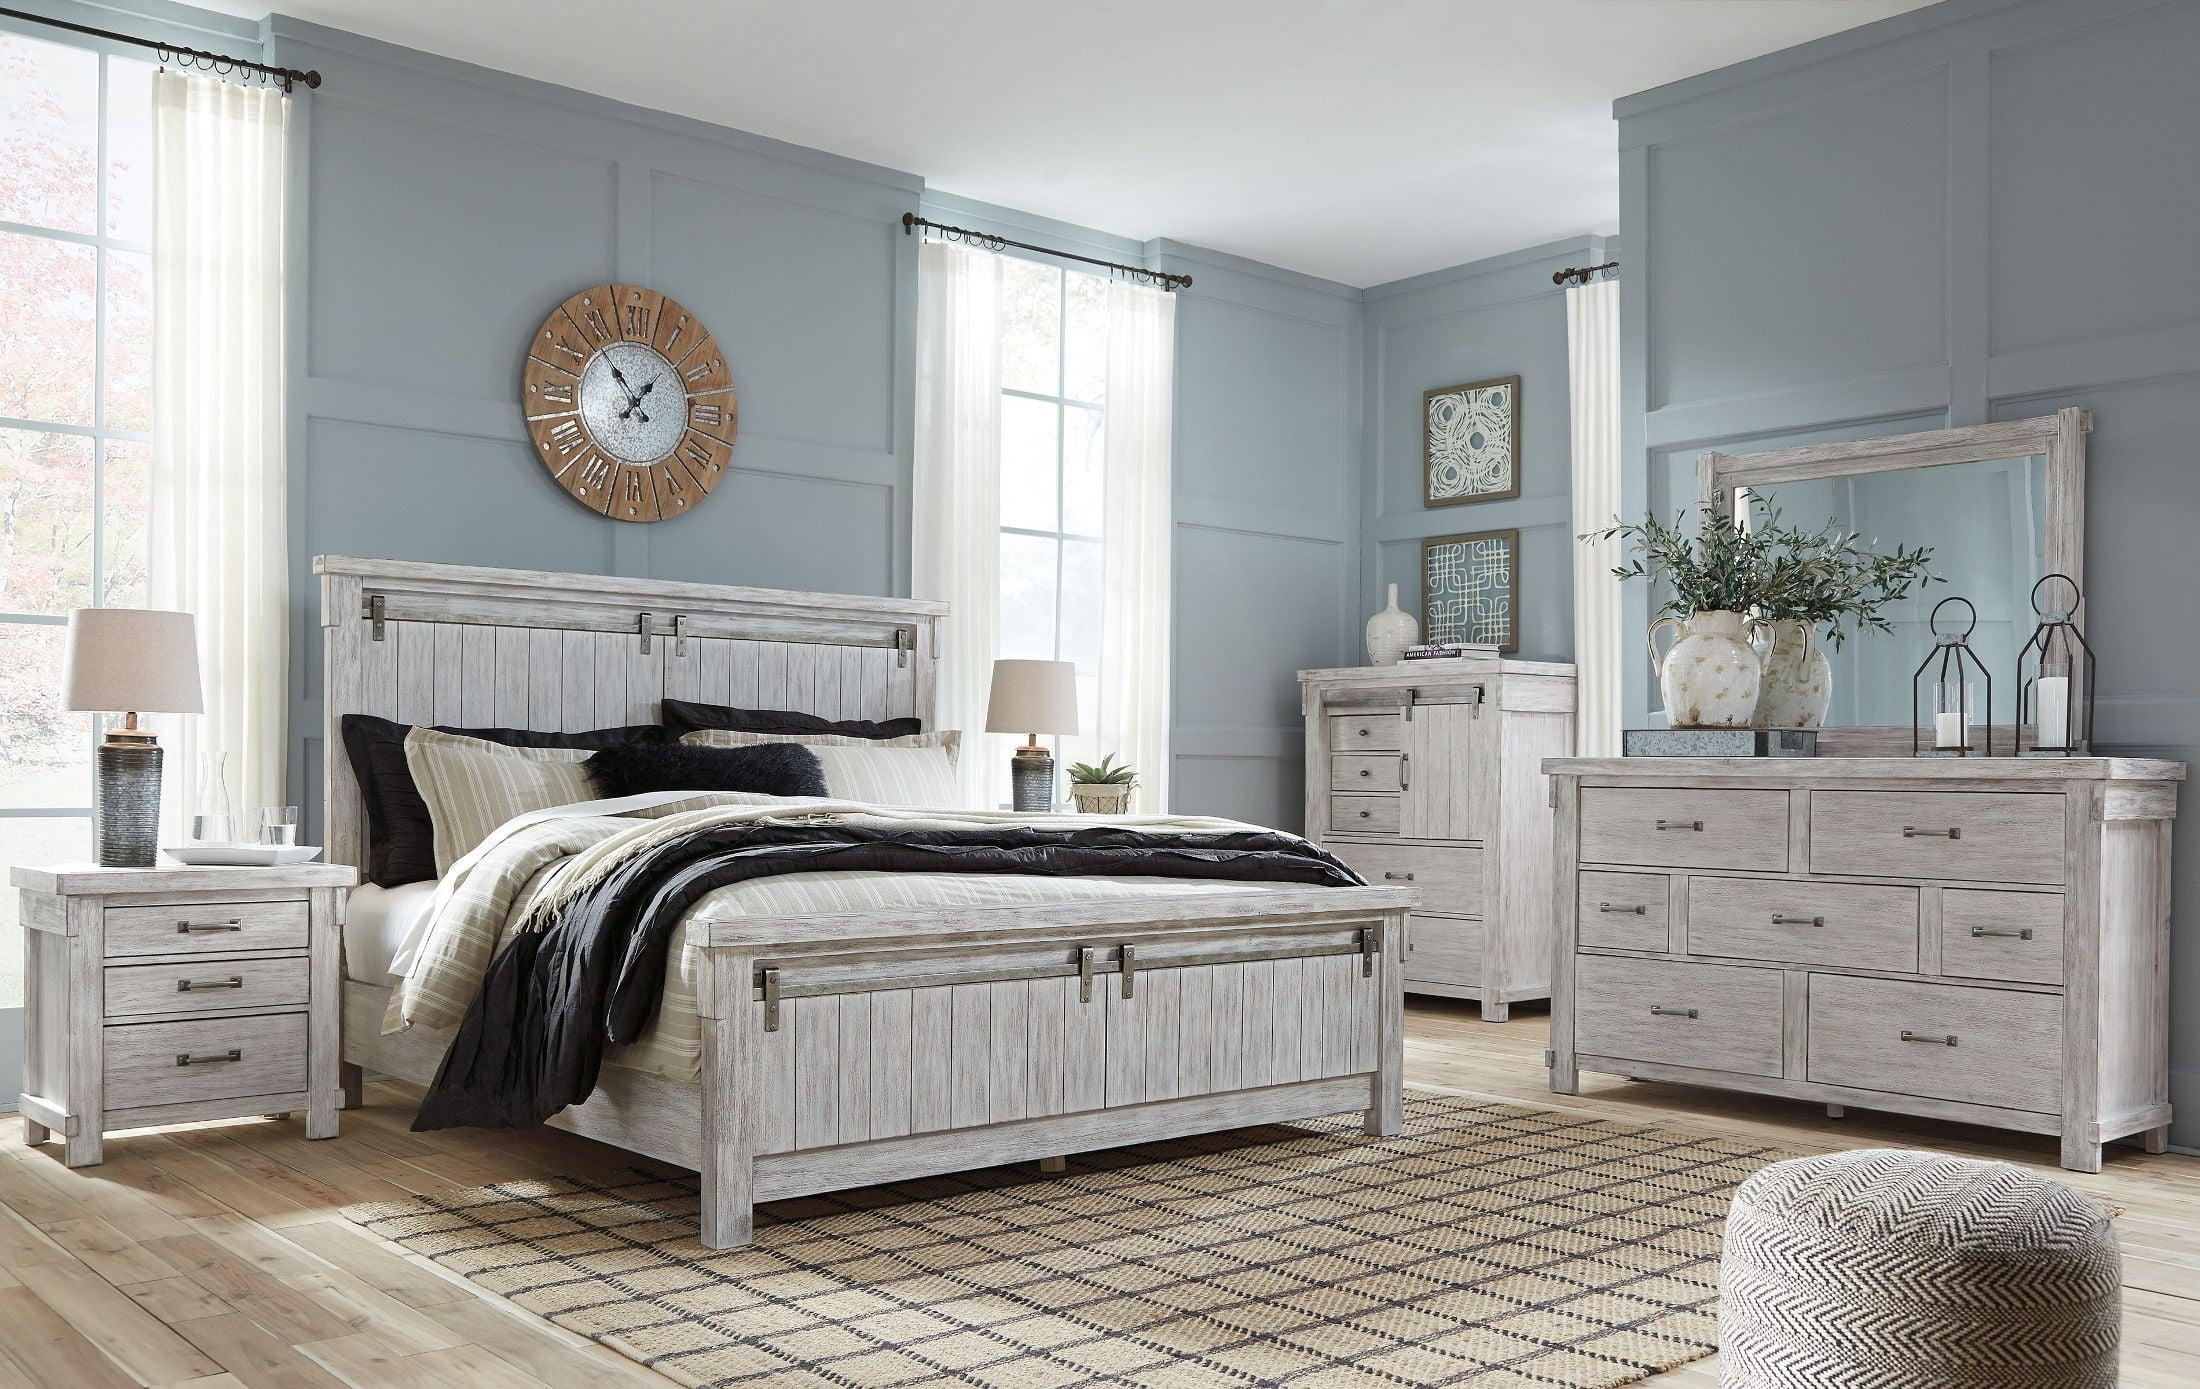 Brashland White Panel Bedroom Set from Ashley  Coleman